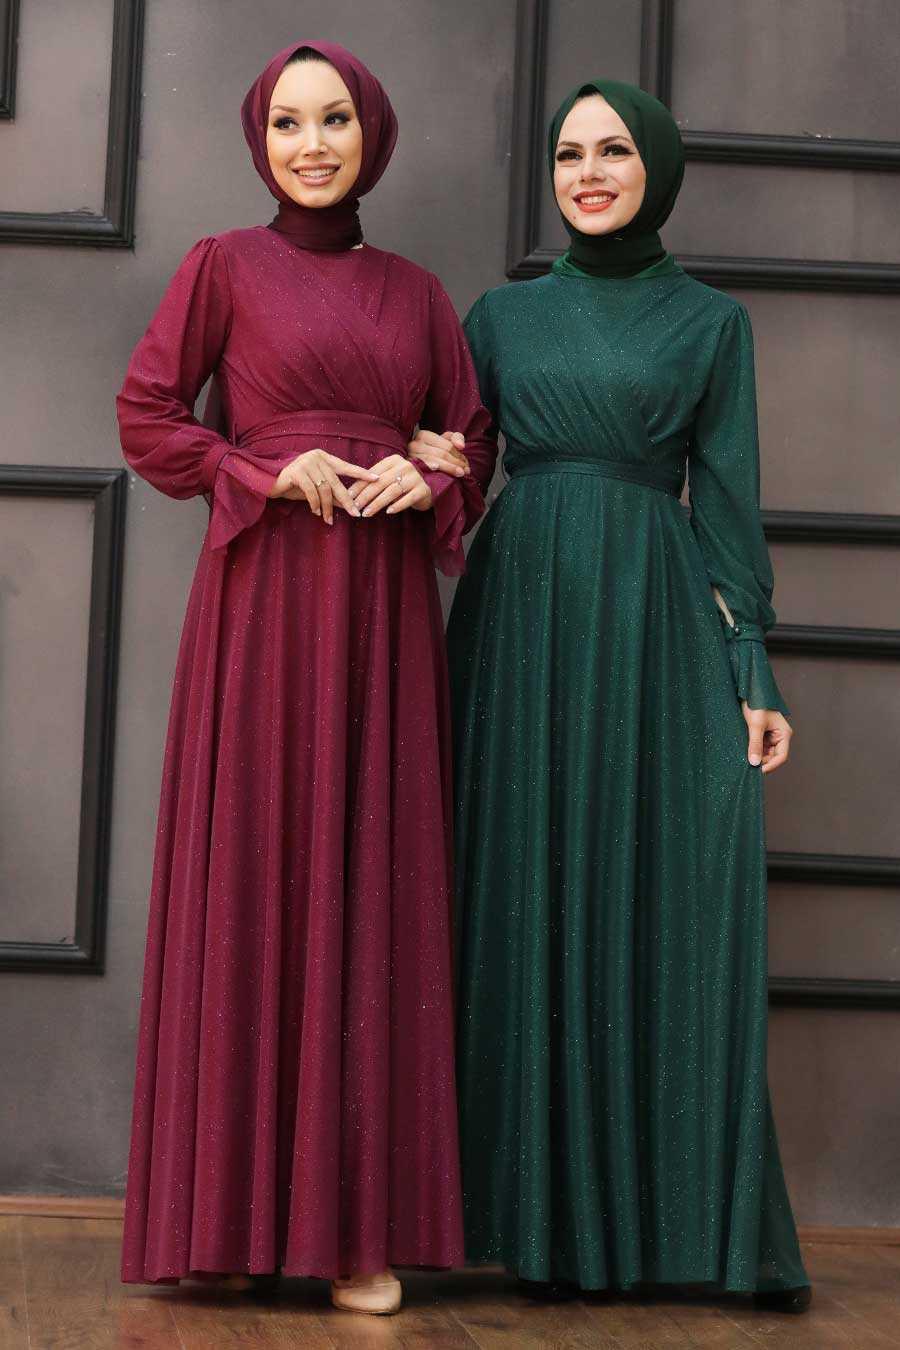 Green Hijab Evening Dress 22202Y